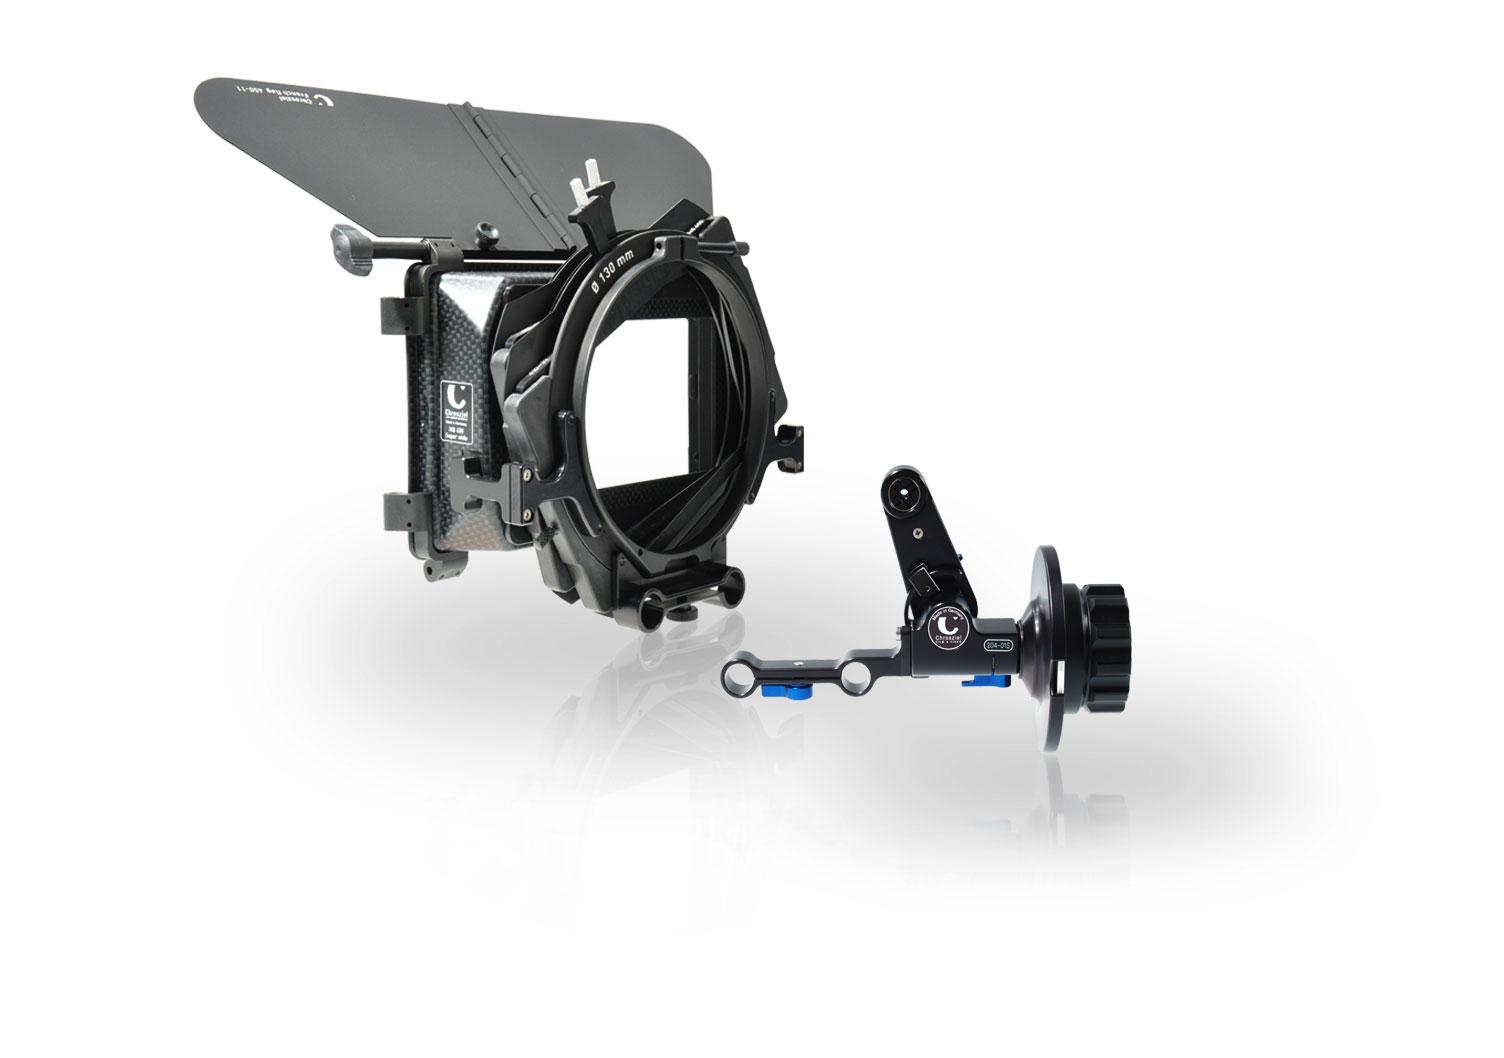 Mattebox Kit Sony FS7 with Light Weight Support+Follow Focus